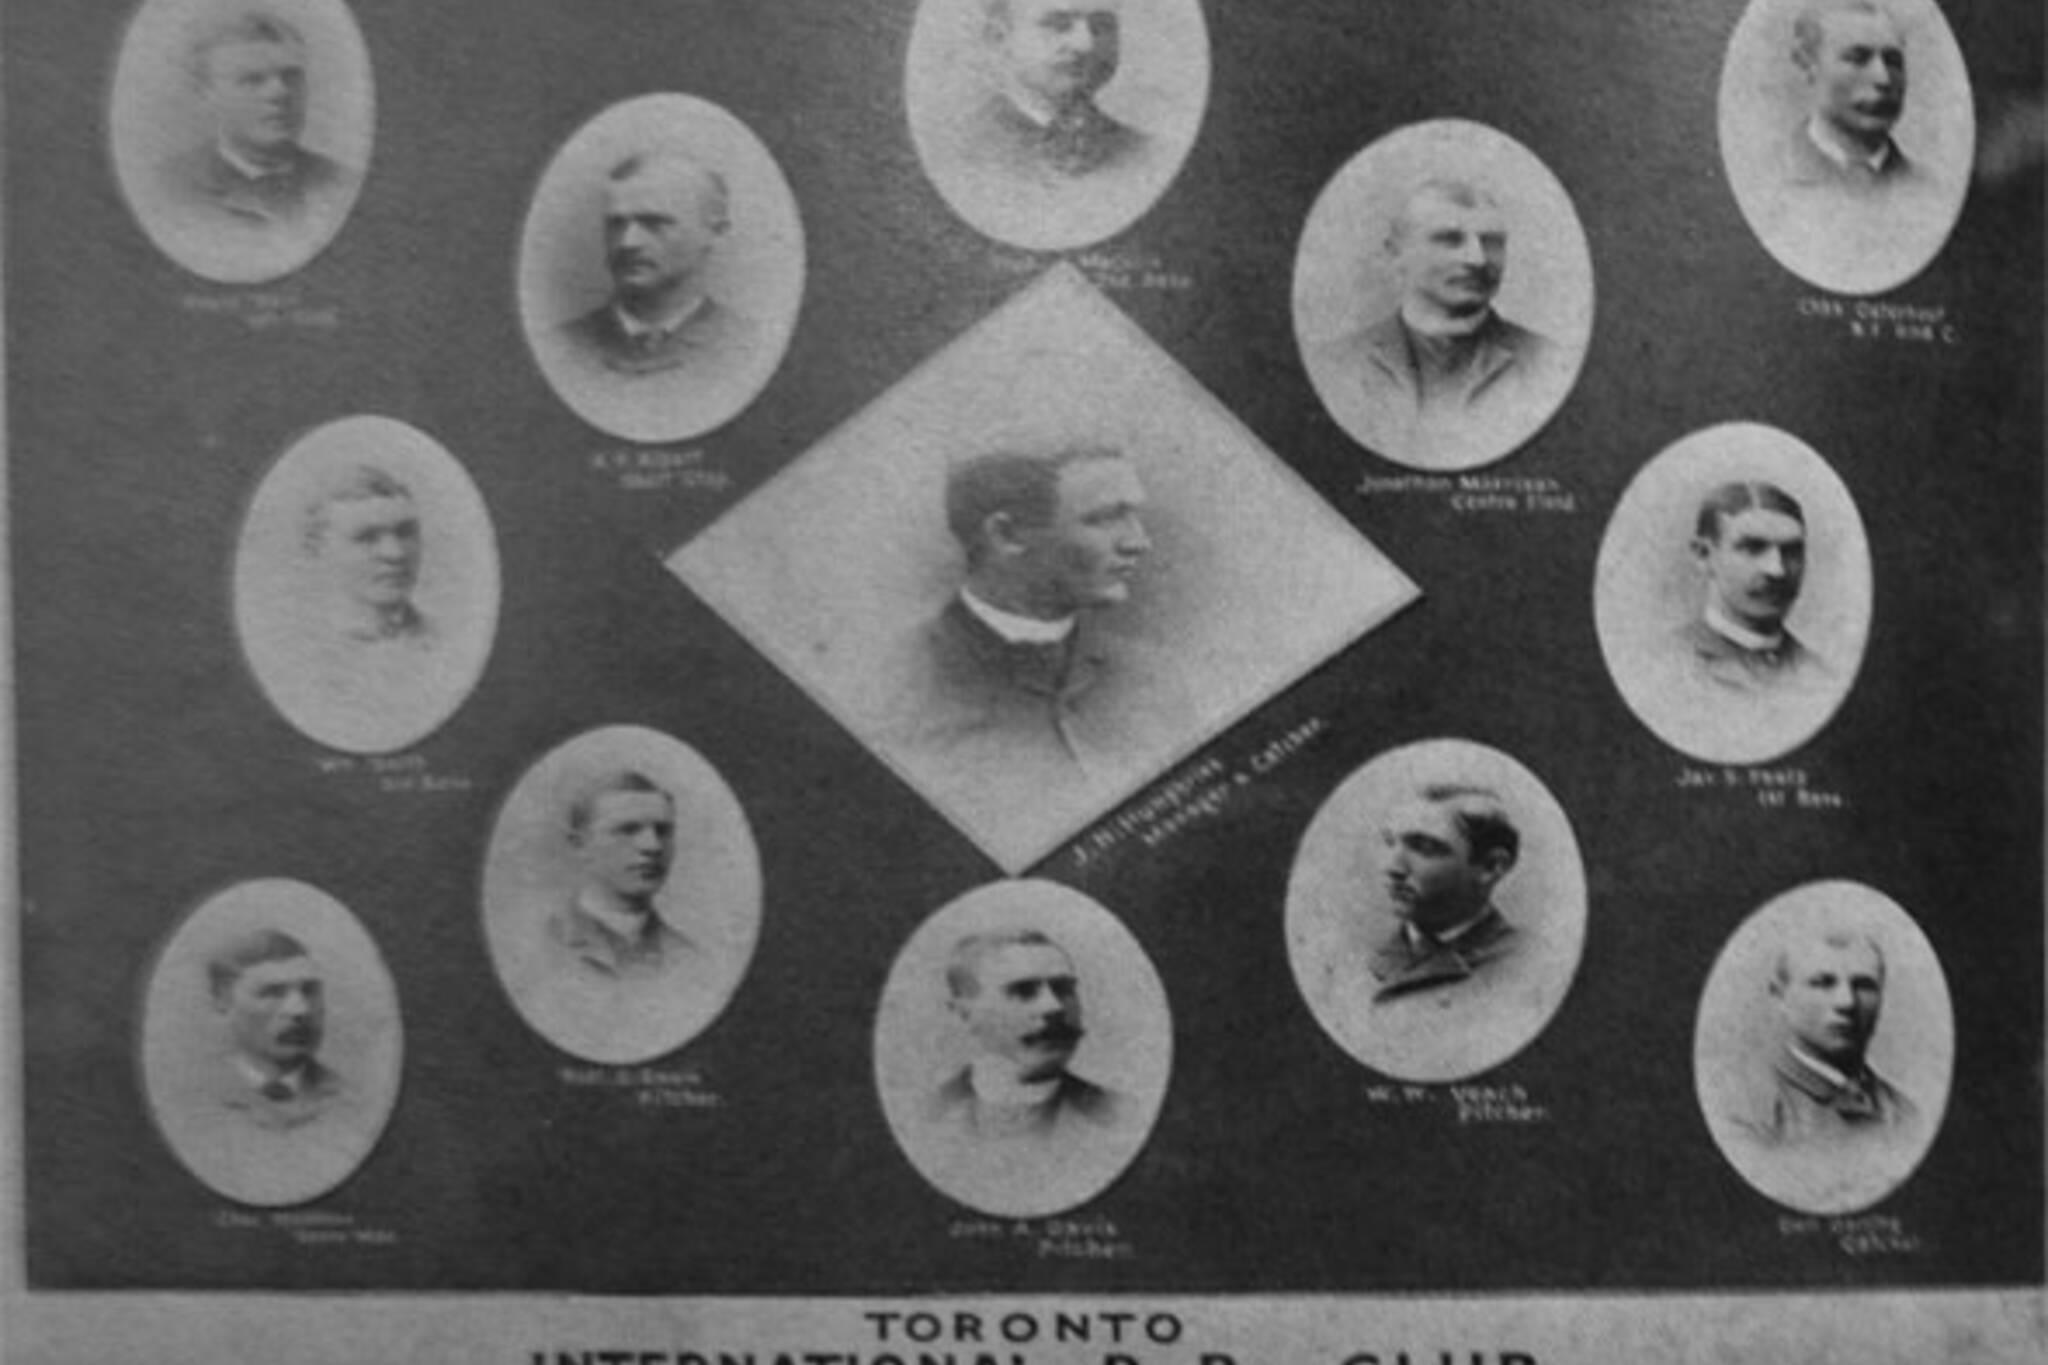 toronto baseball team